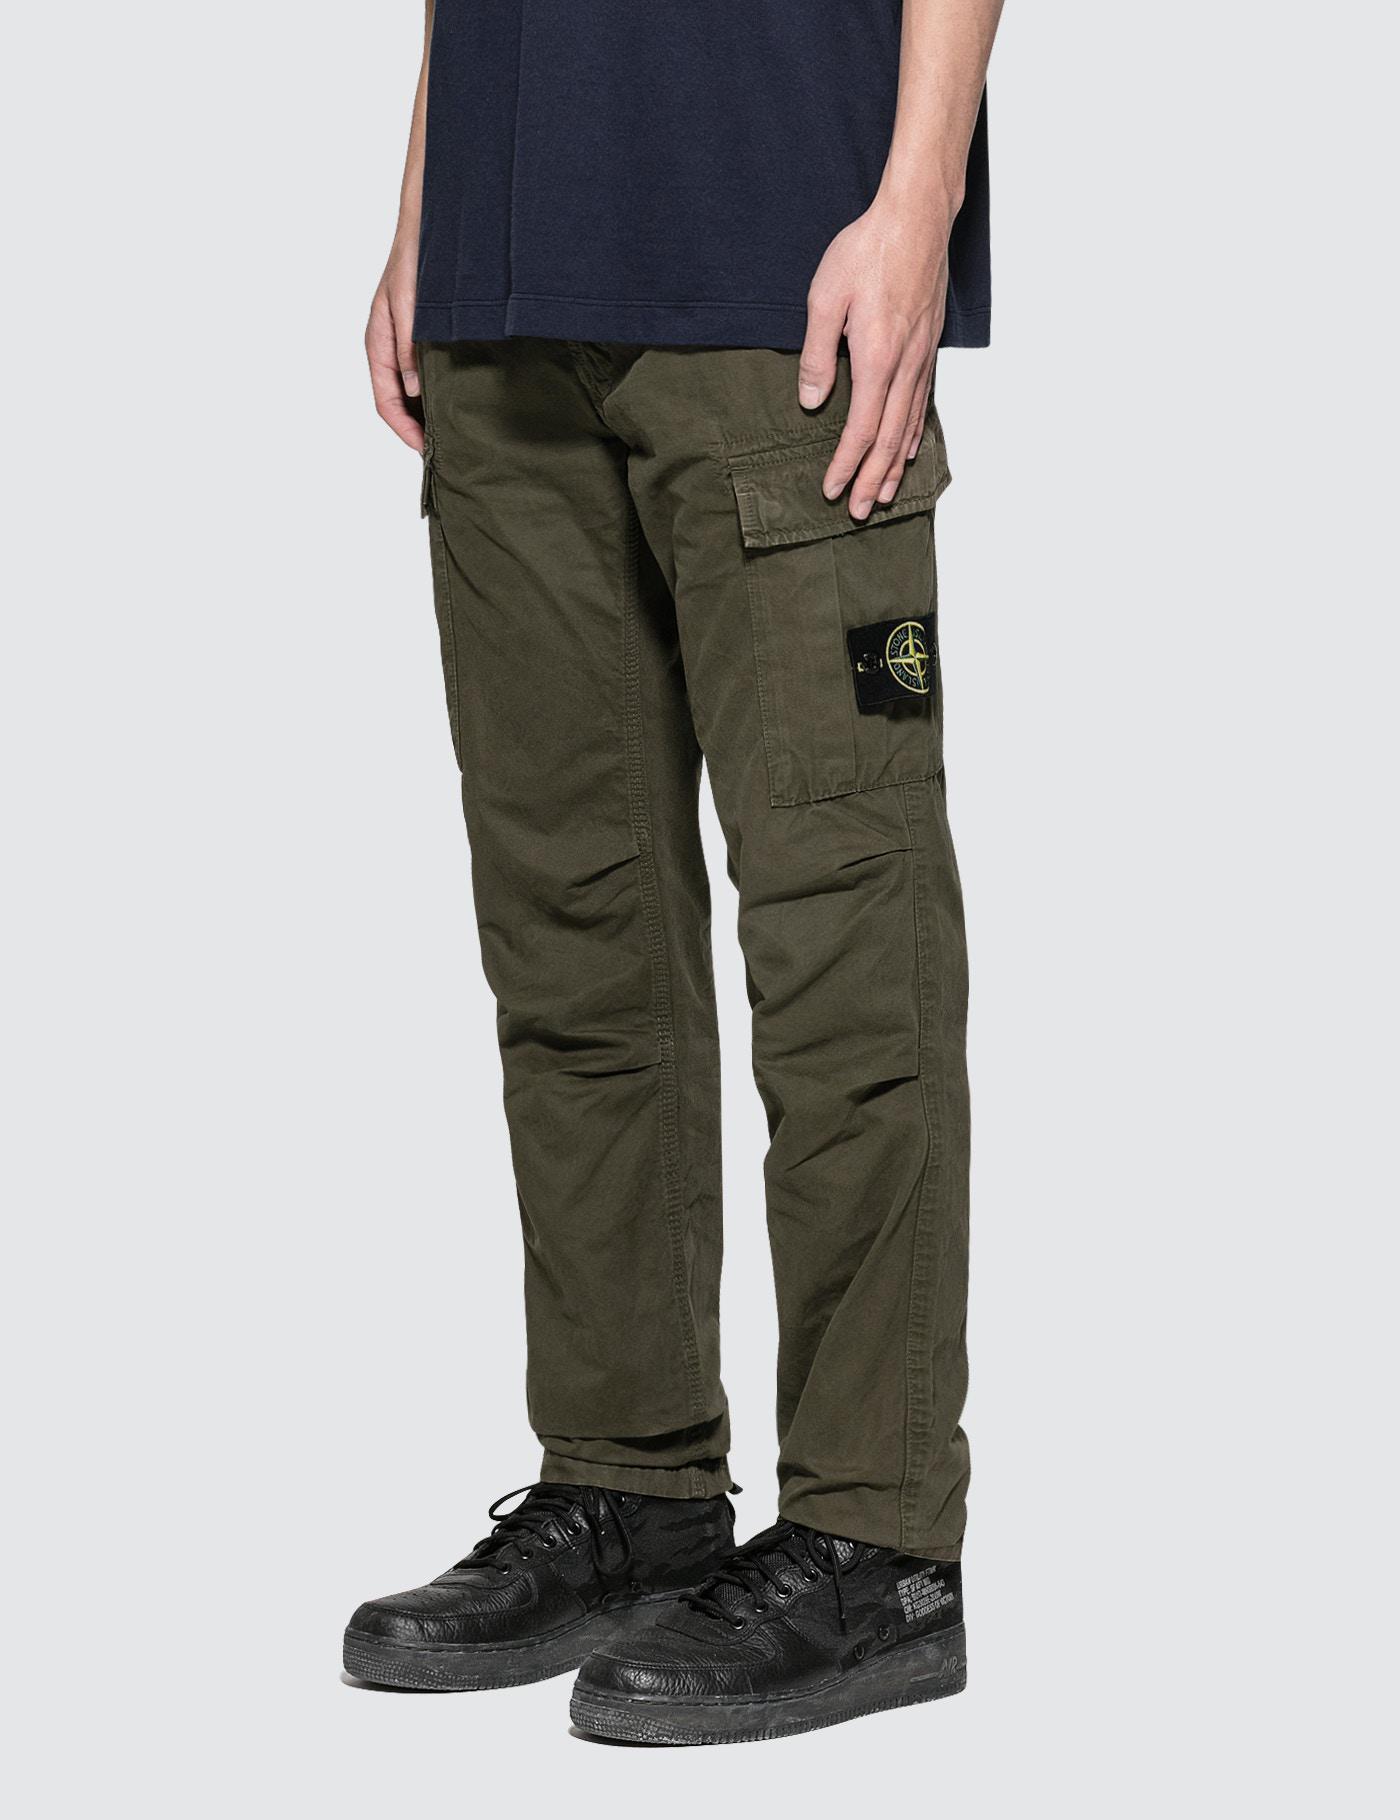 Stone Island Slim Cargo Pants